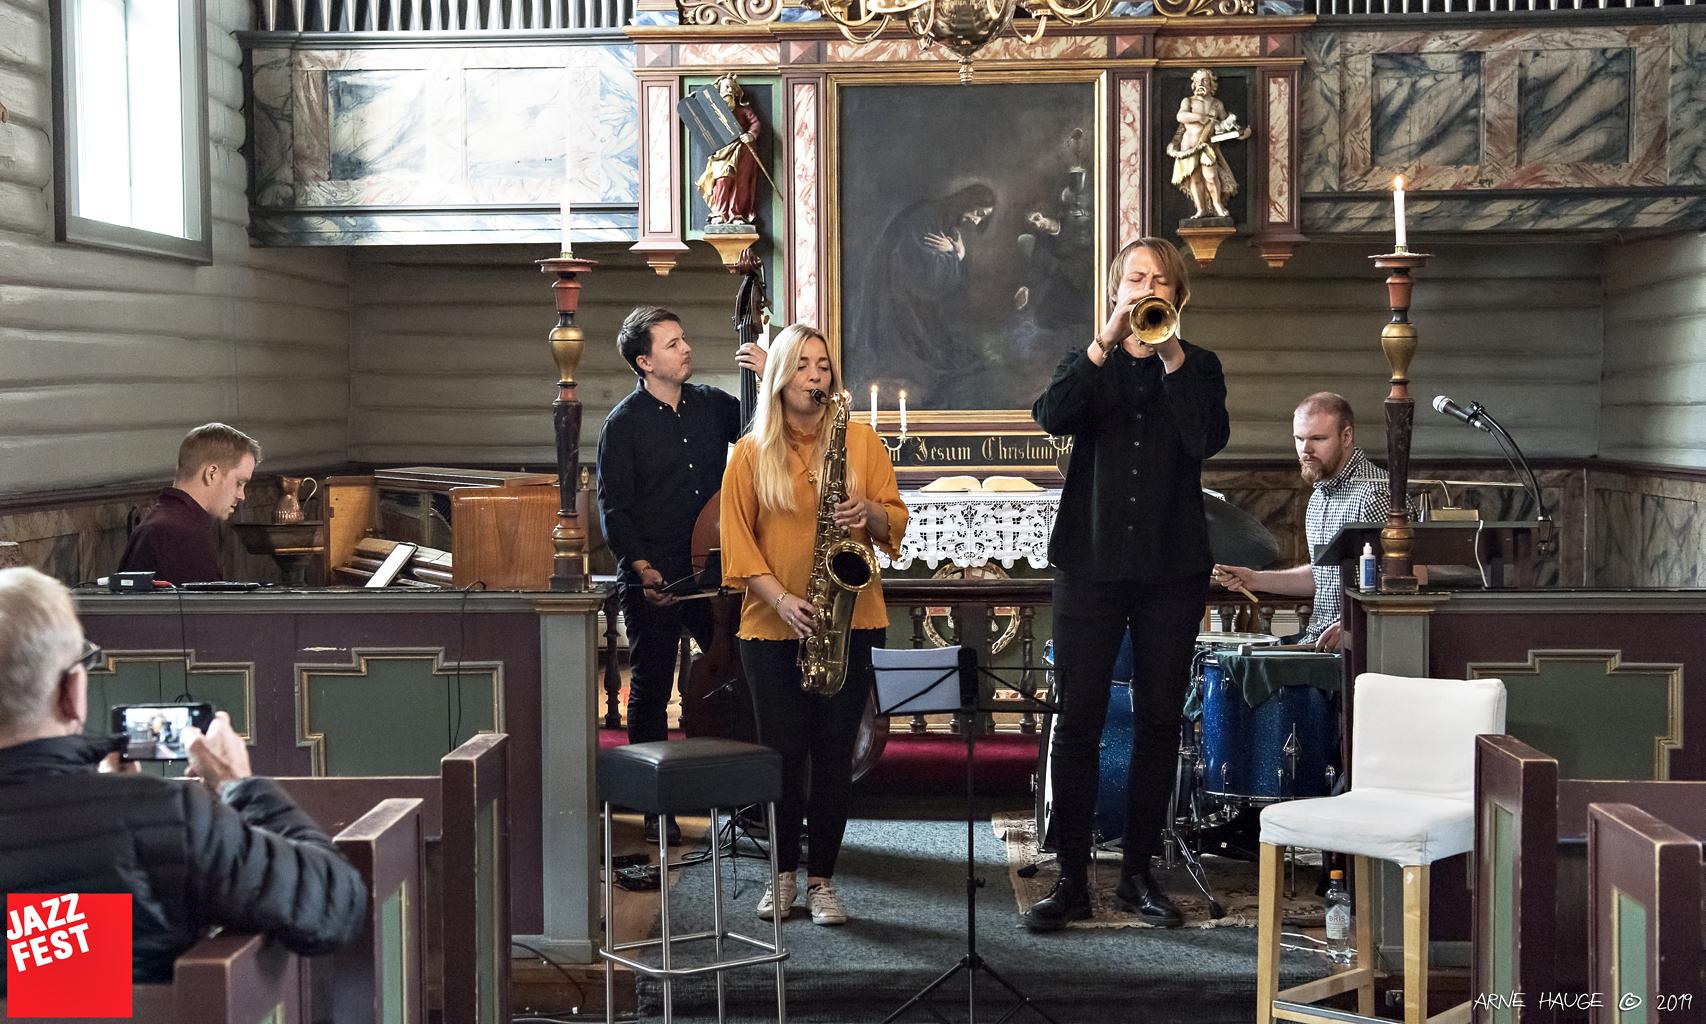 190510 Jazzfilosofisk Kafe @ Bakke Kirke - foto Arne Hauge_001.jpg